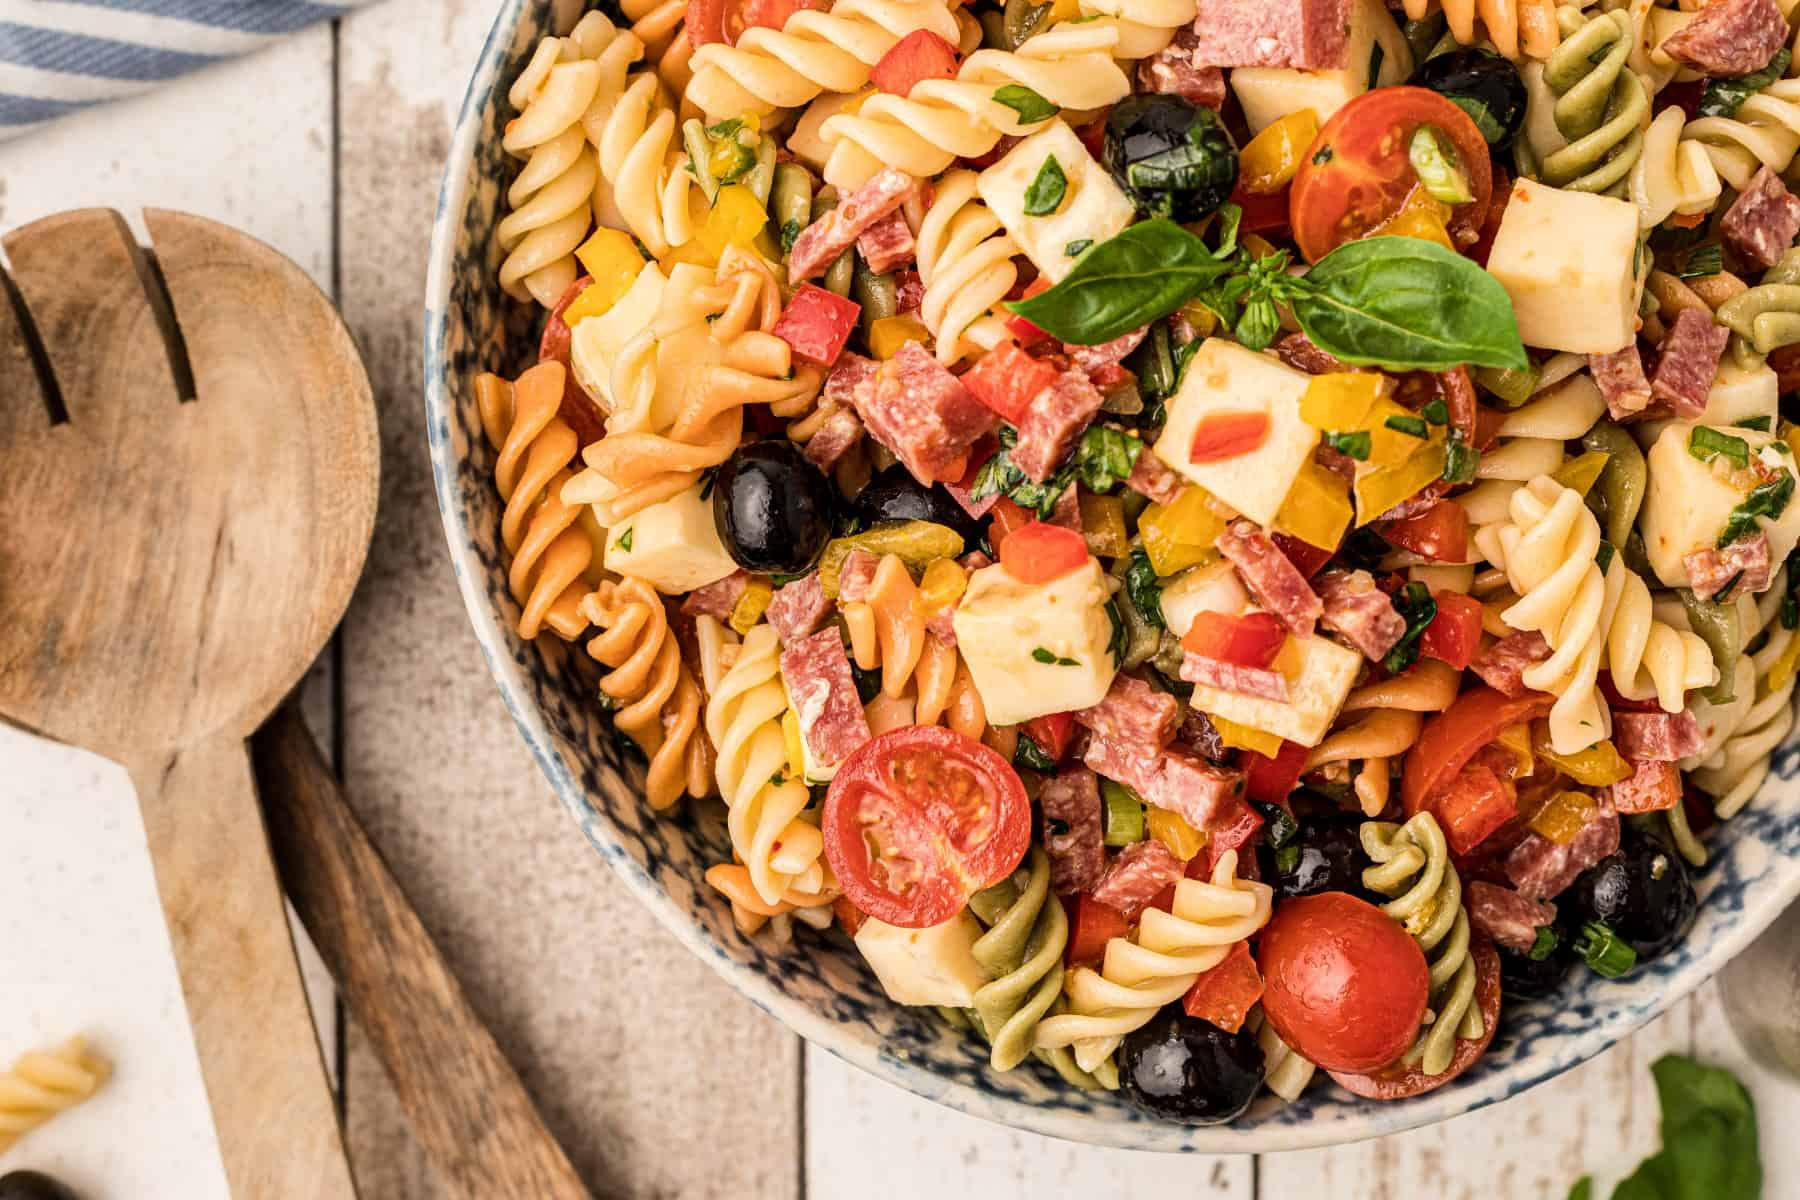 Overhead Italian pasta salad with wooden salad servers.